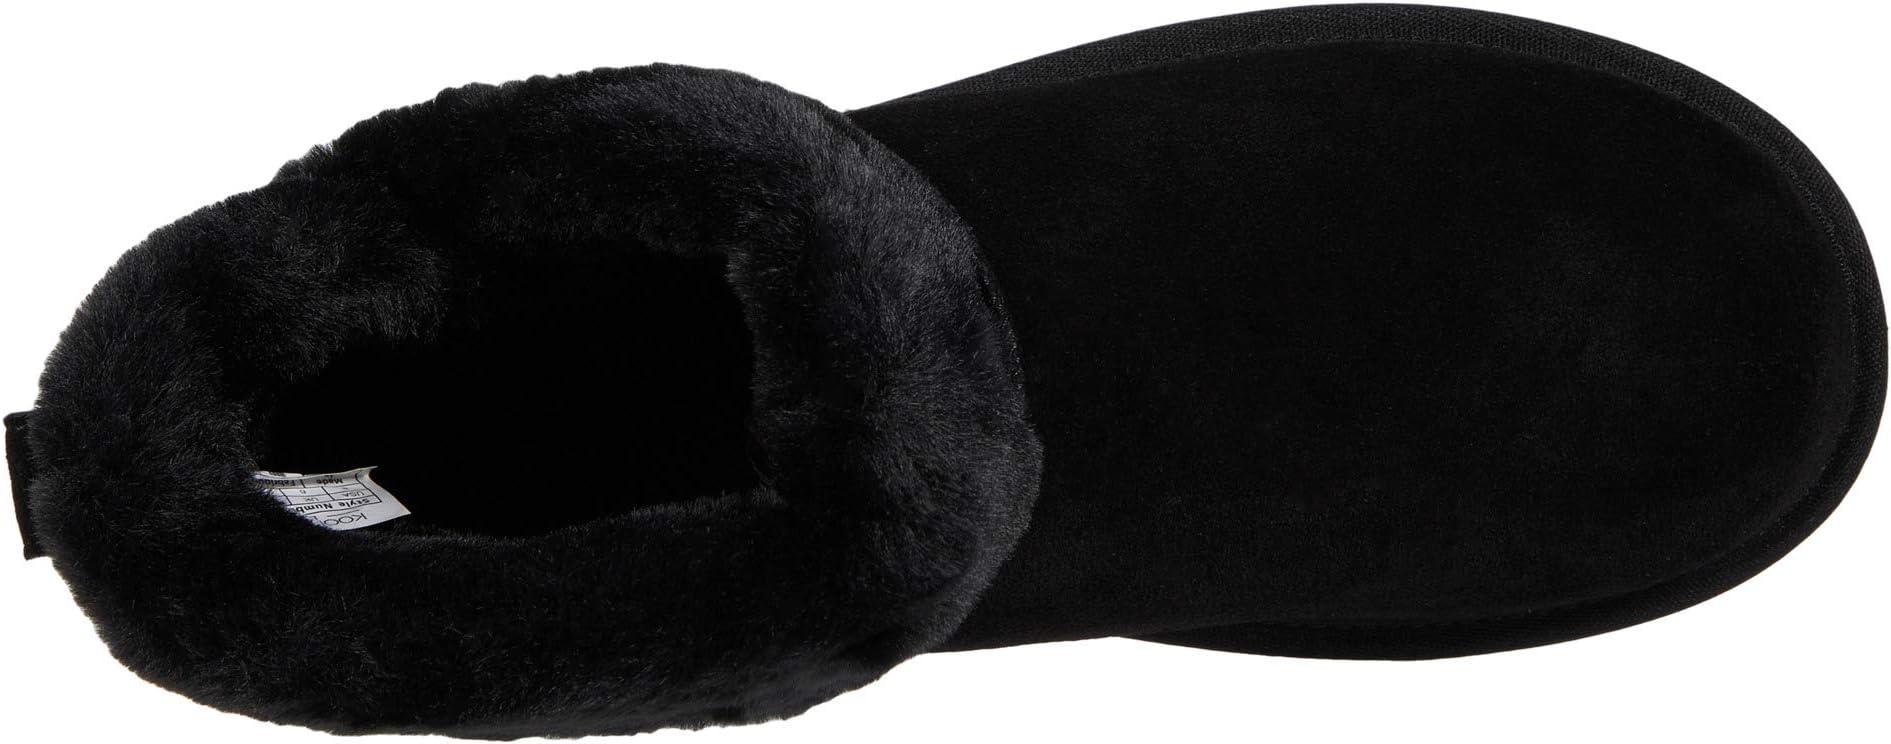 Koolaburra by UGG Dezi Mini | Women's shoes | 2020 Newest